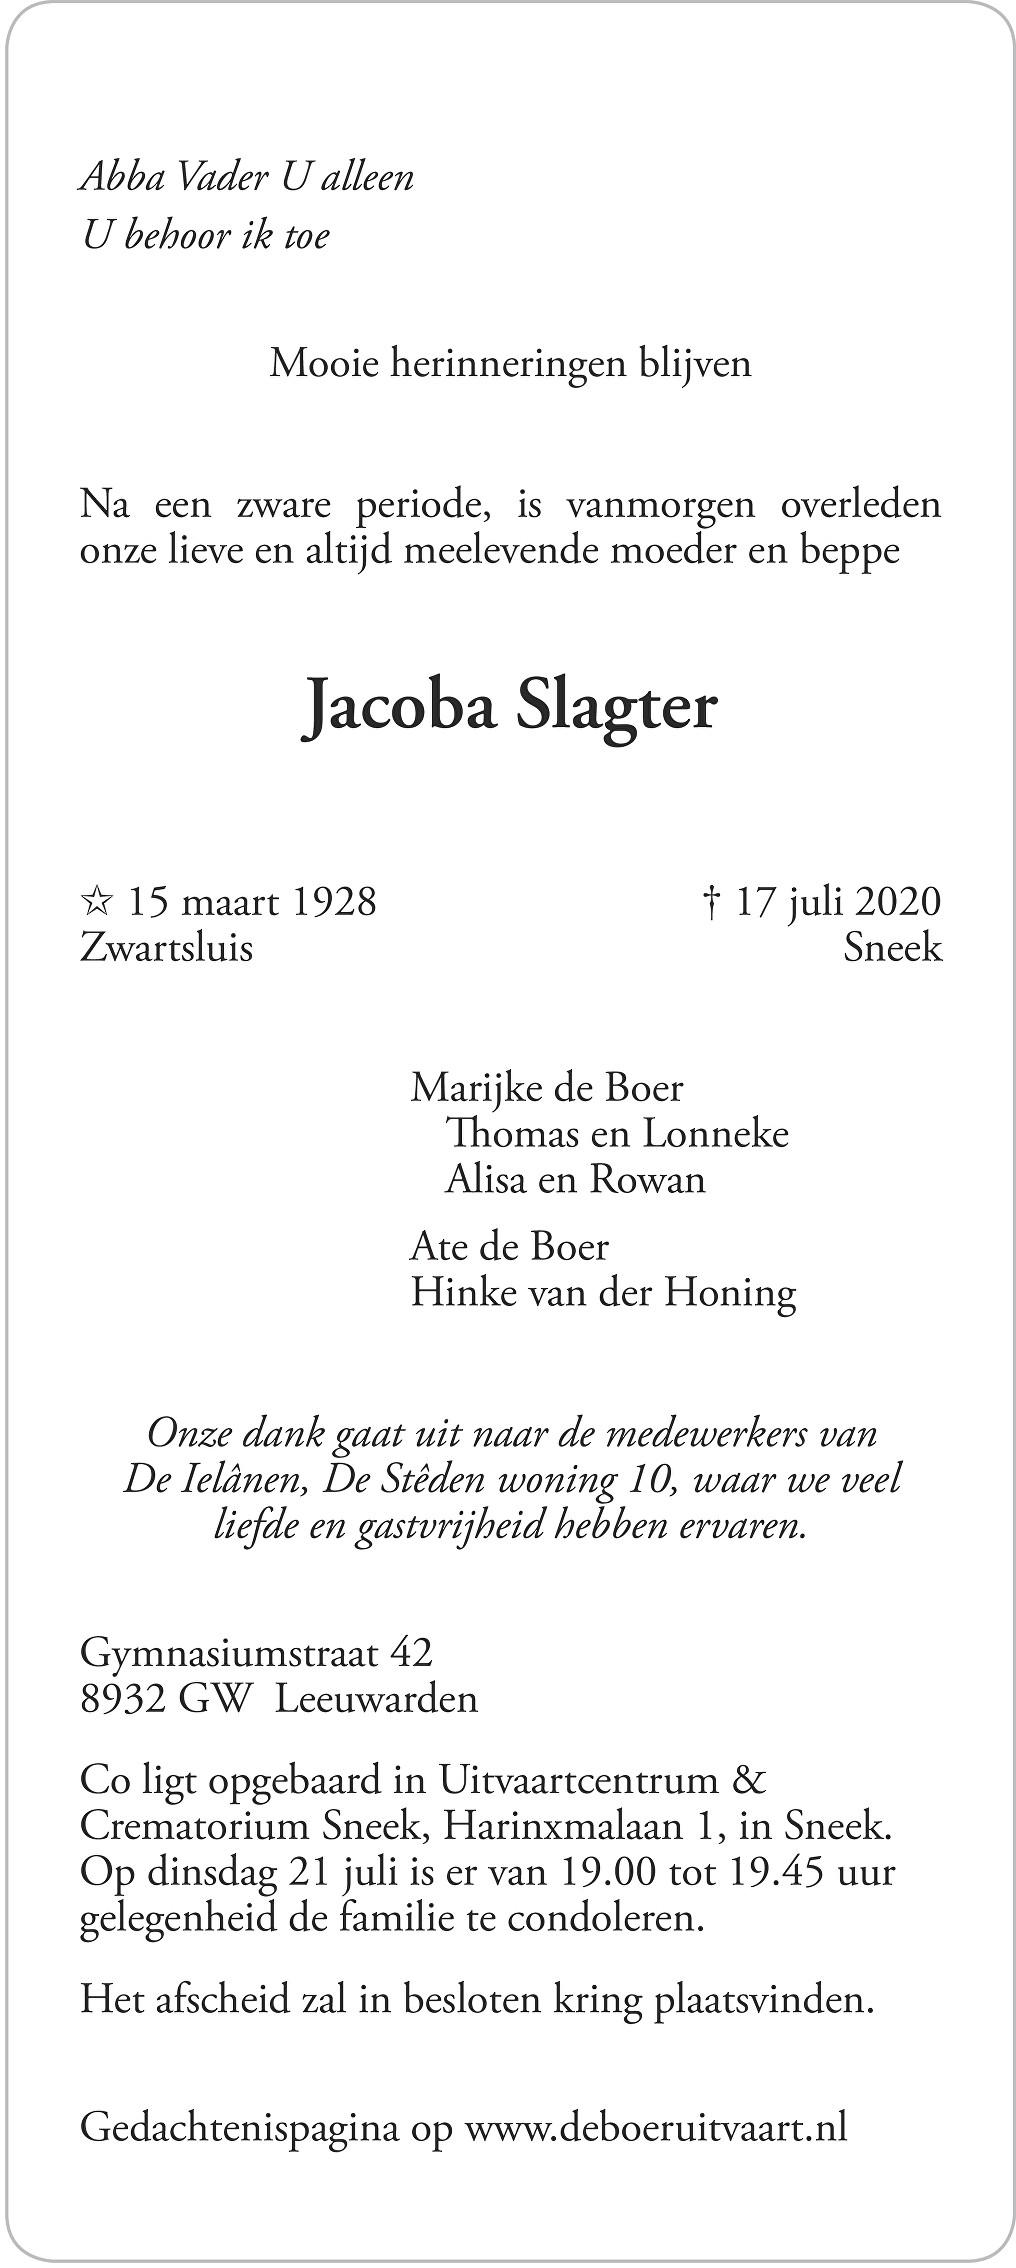 Jacoba de Boer-Slagter Death notice